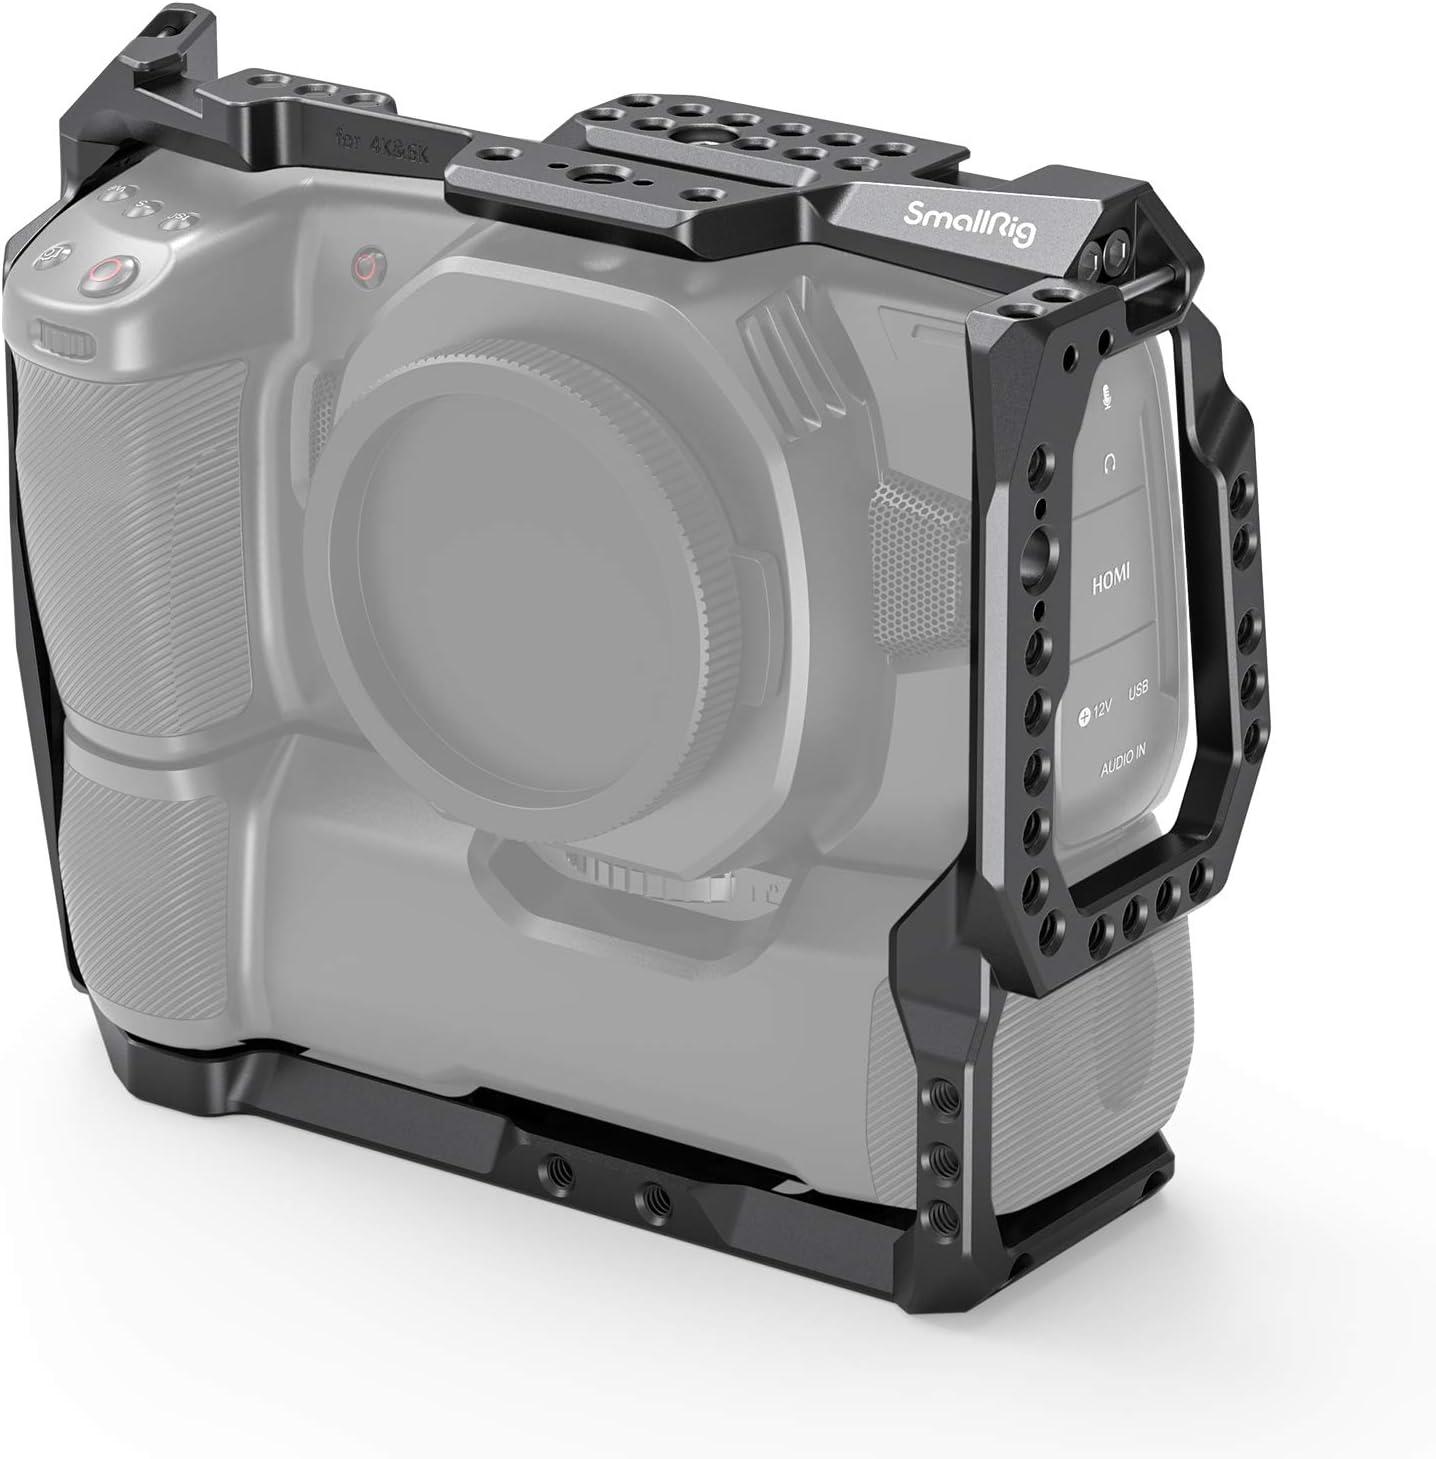 Amazon Com Smallrig Bmpcc 4k 6k Cage For Blackmagic Design Pocket Cinema Camera 4k 6k With Battery Grip Attached 2765 Camera Photo